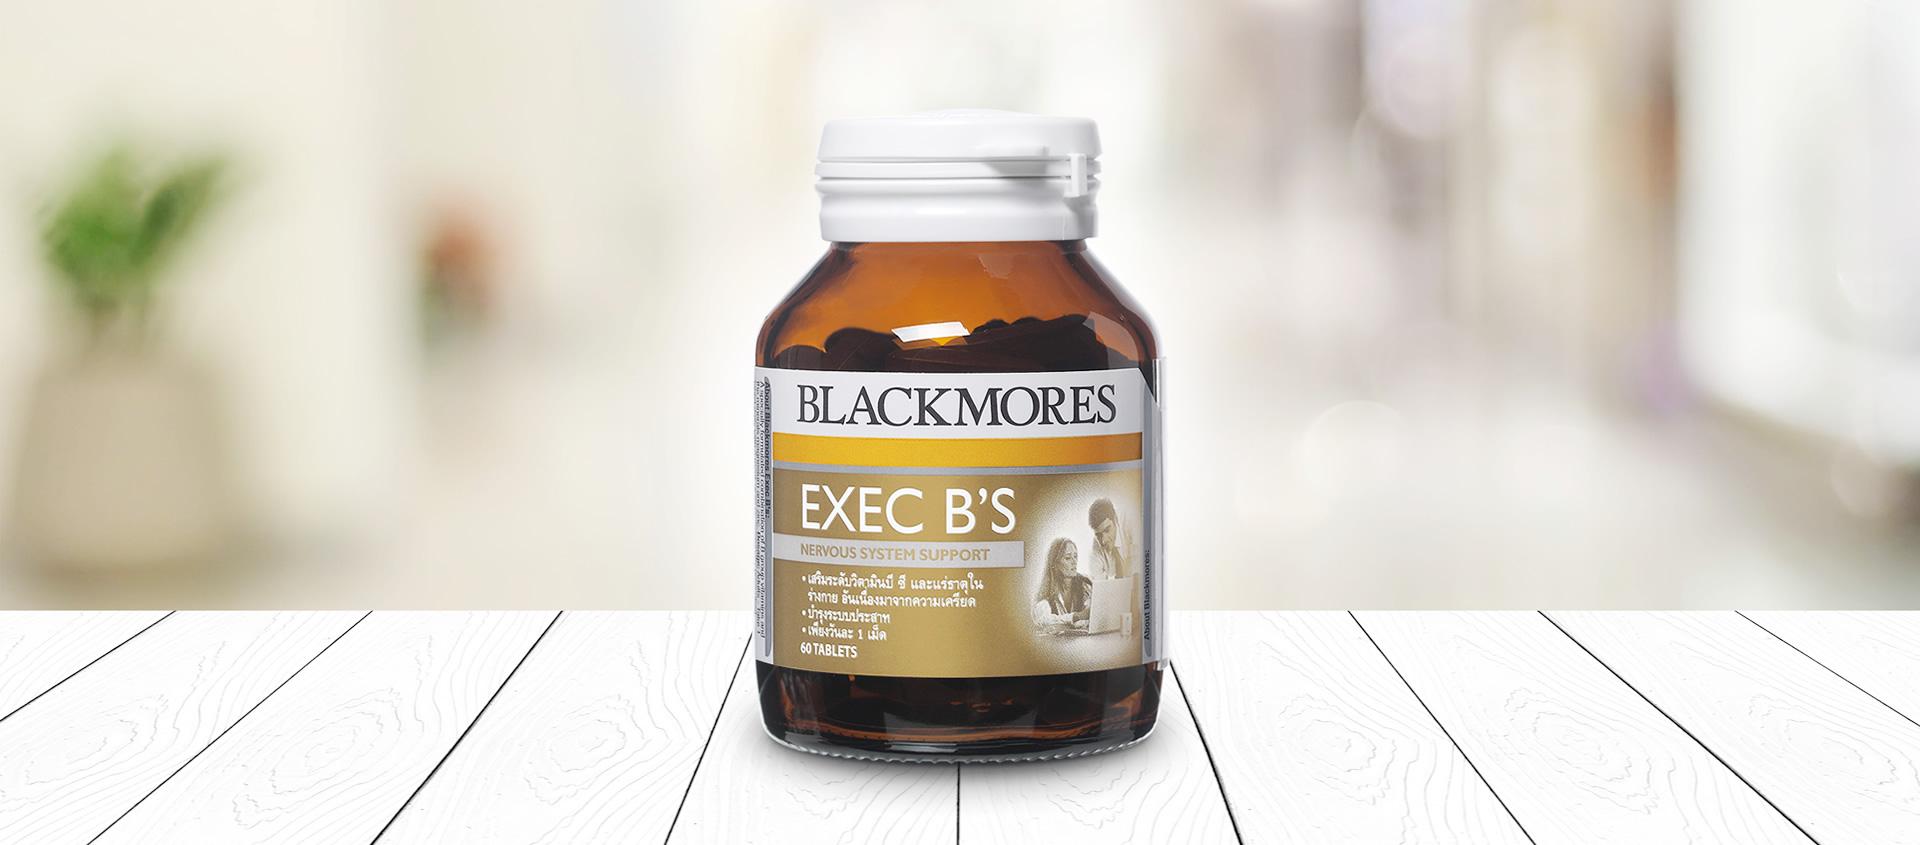 Blackmores Exec B'S แบลคมอร์ส เอ็กเซค บีส์